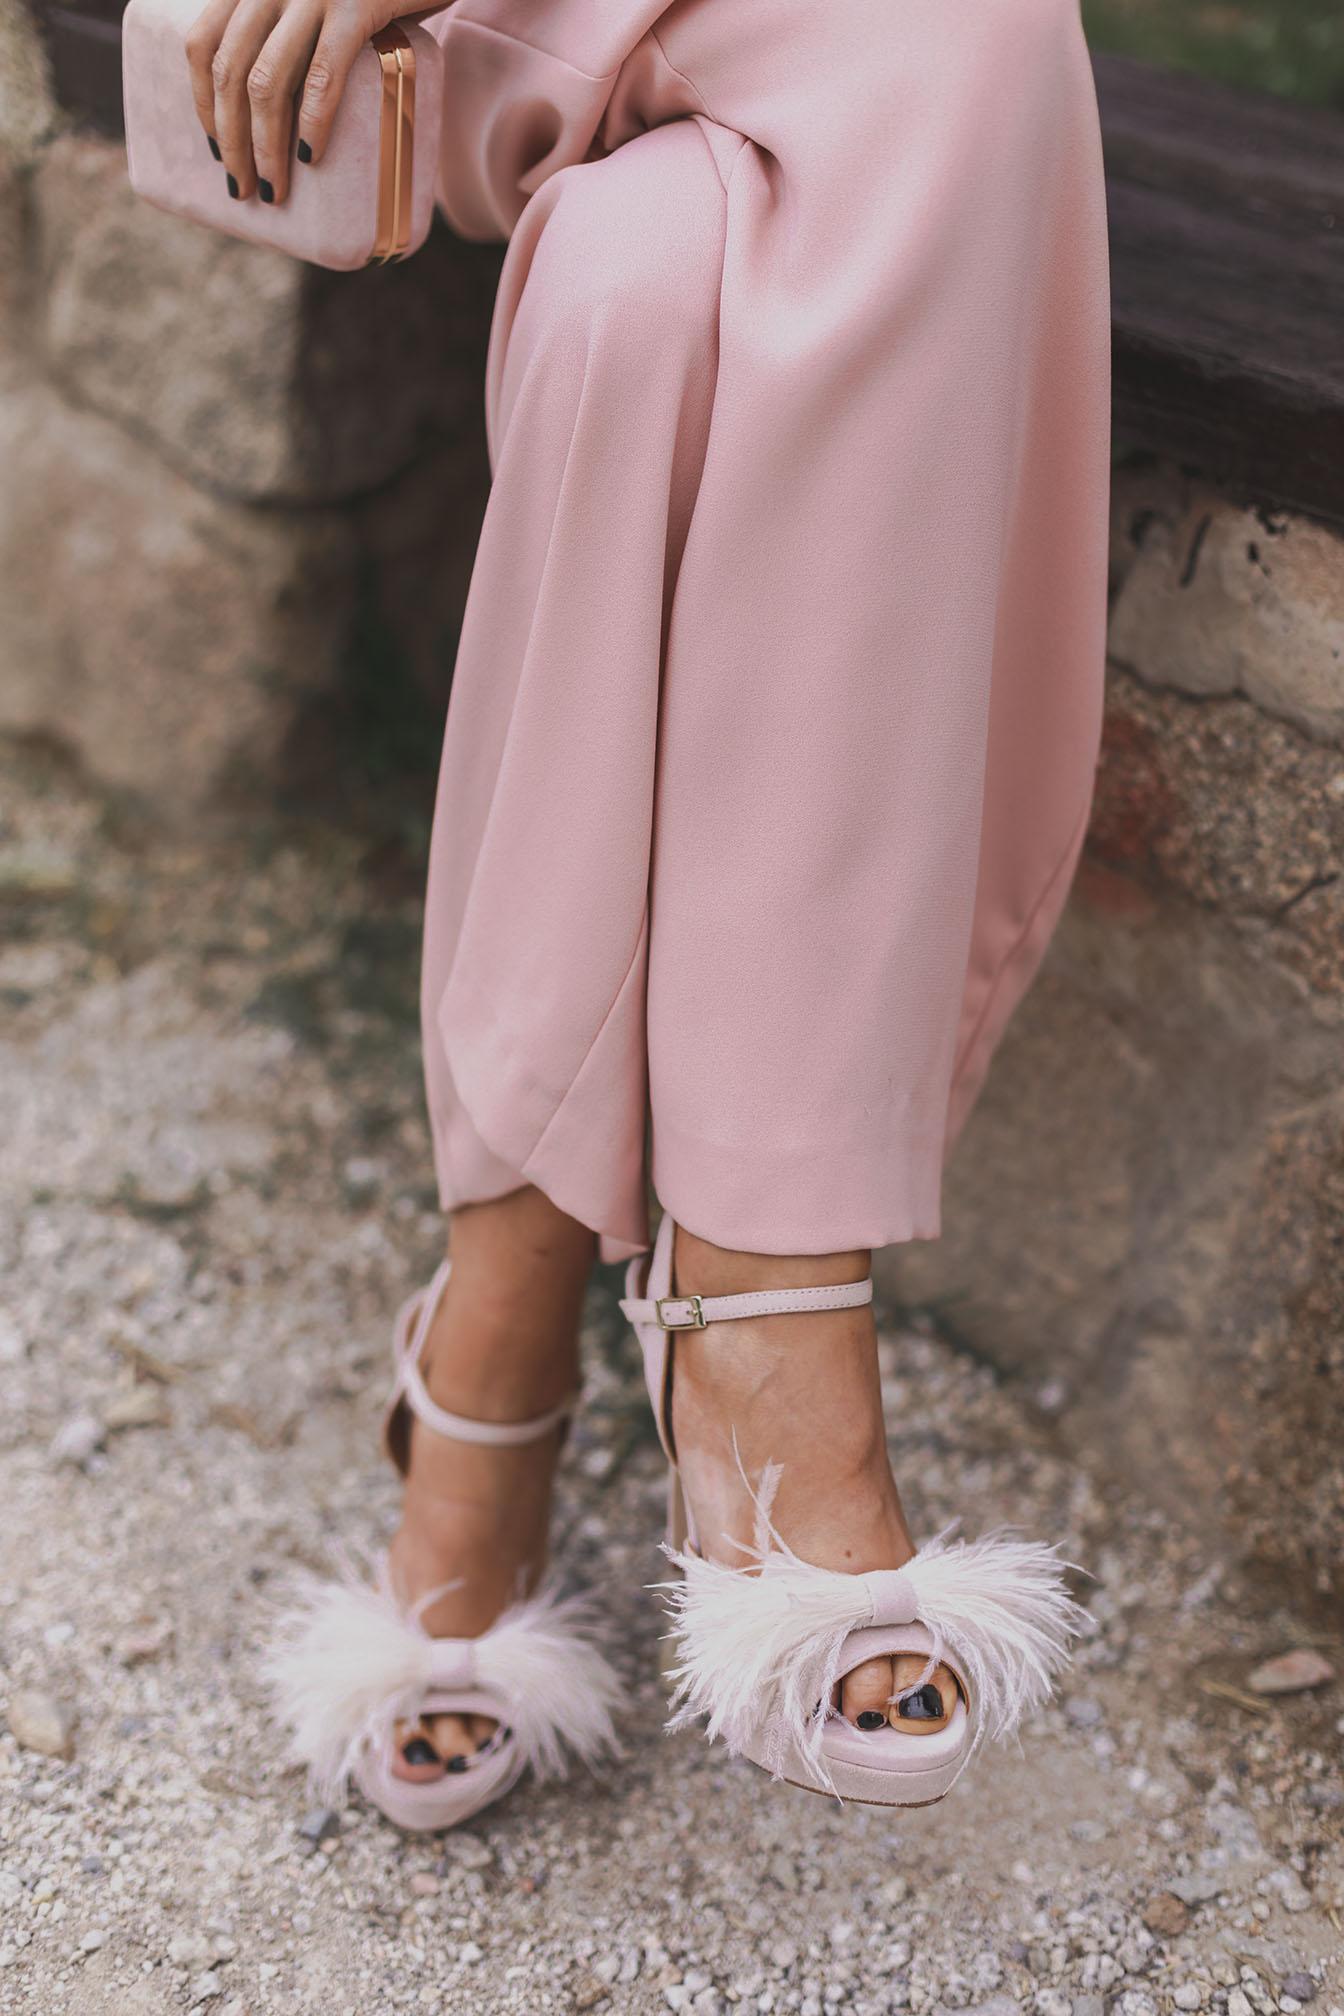 Sandalia plumas invitada boda